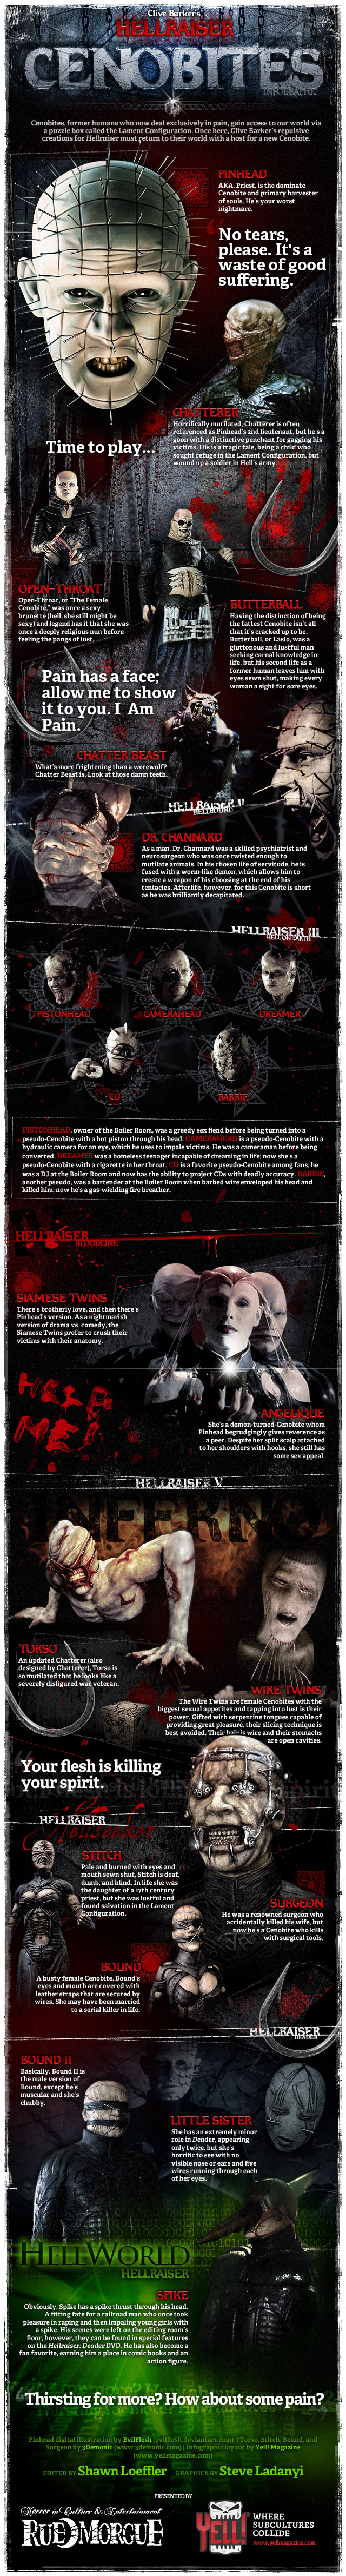 Hellraiser infographic